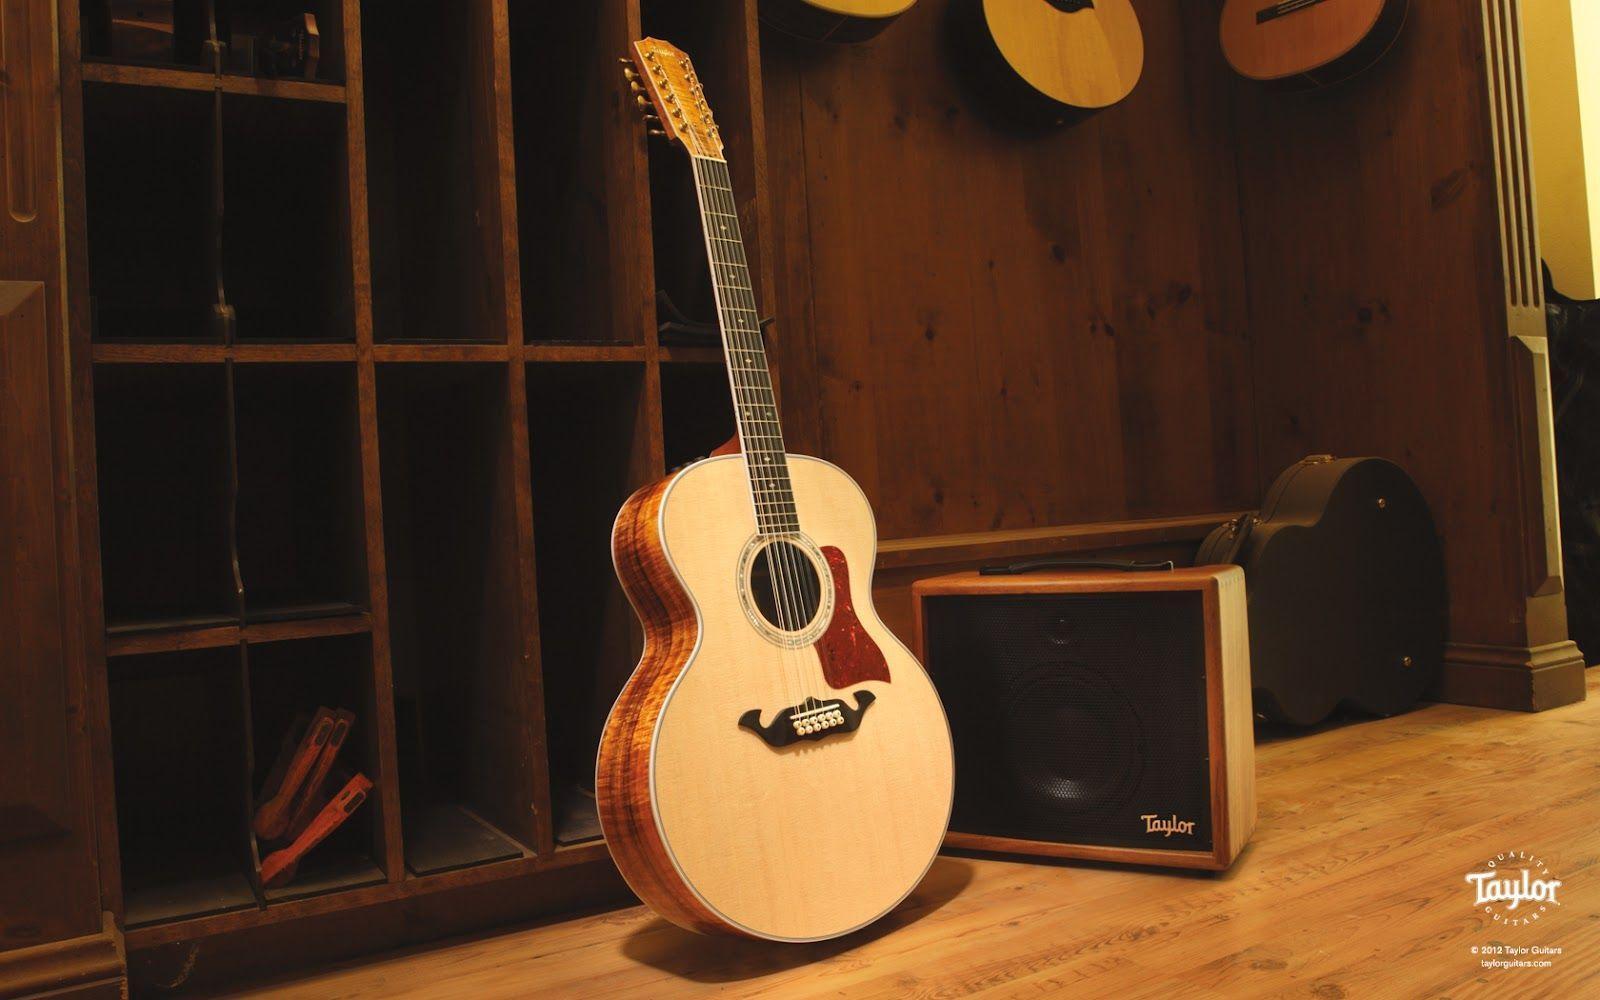 Taylor Guitars Wallpapers Wallpaper Cave